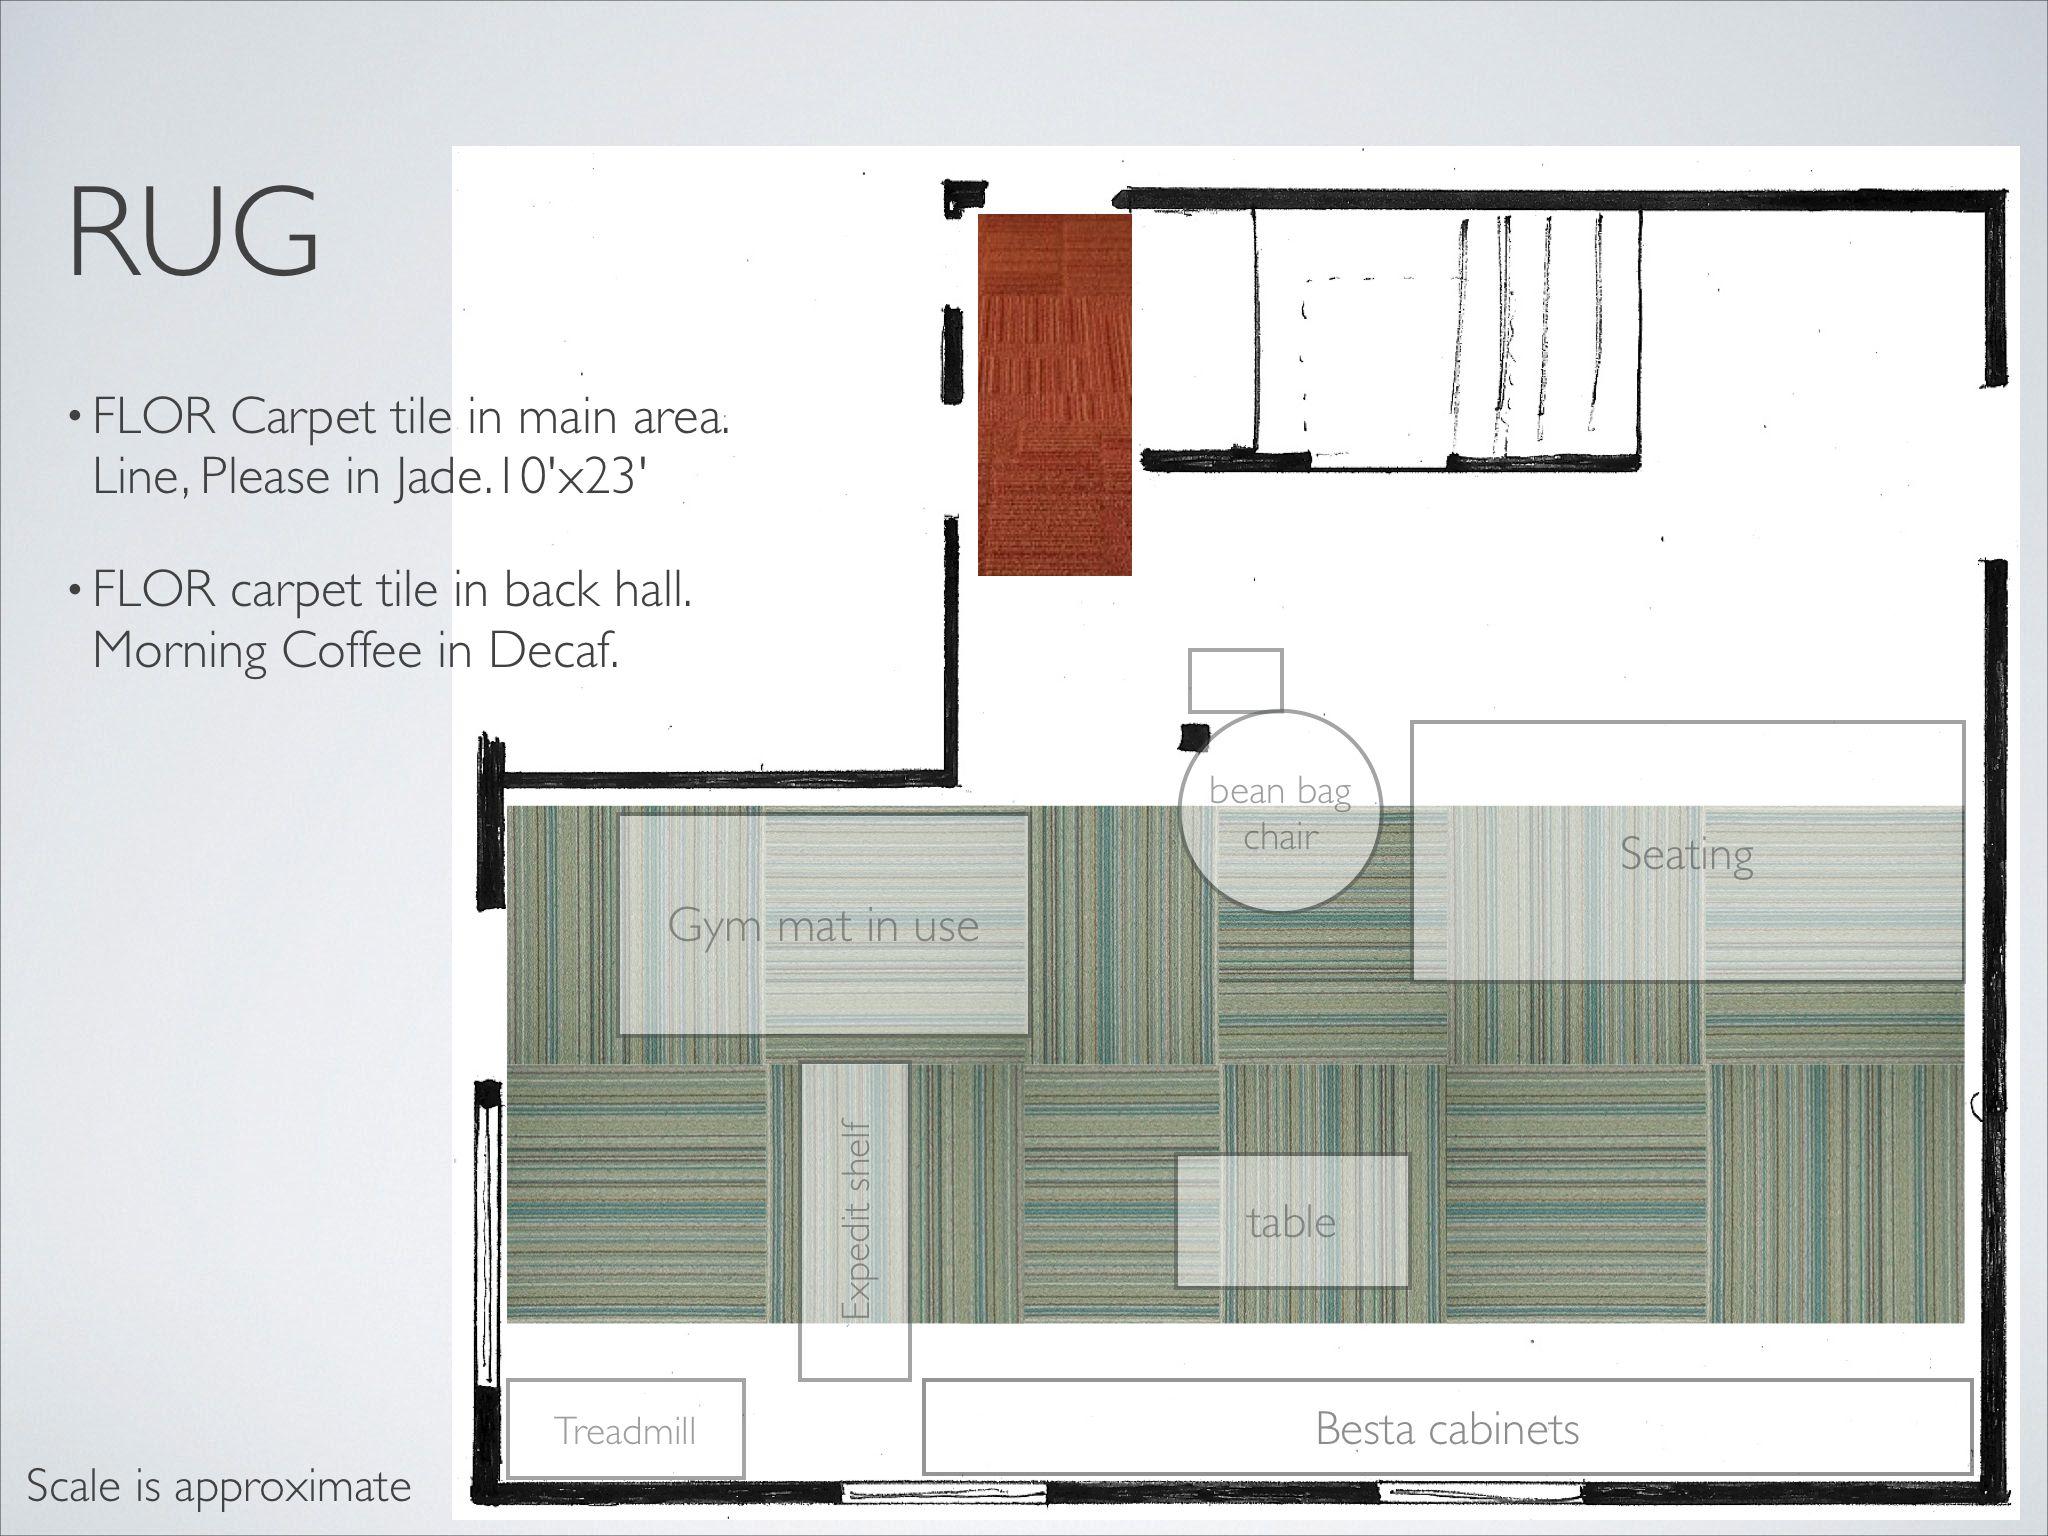 Playroom Media Room Floor Plan Showing Carpet Tile Concept Modern Playroom Carpet Tiles Bean Bag Chair